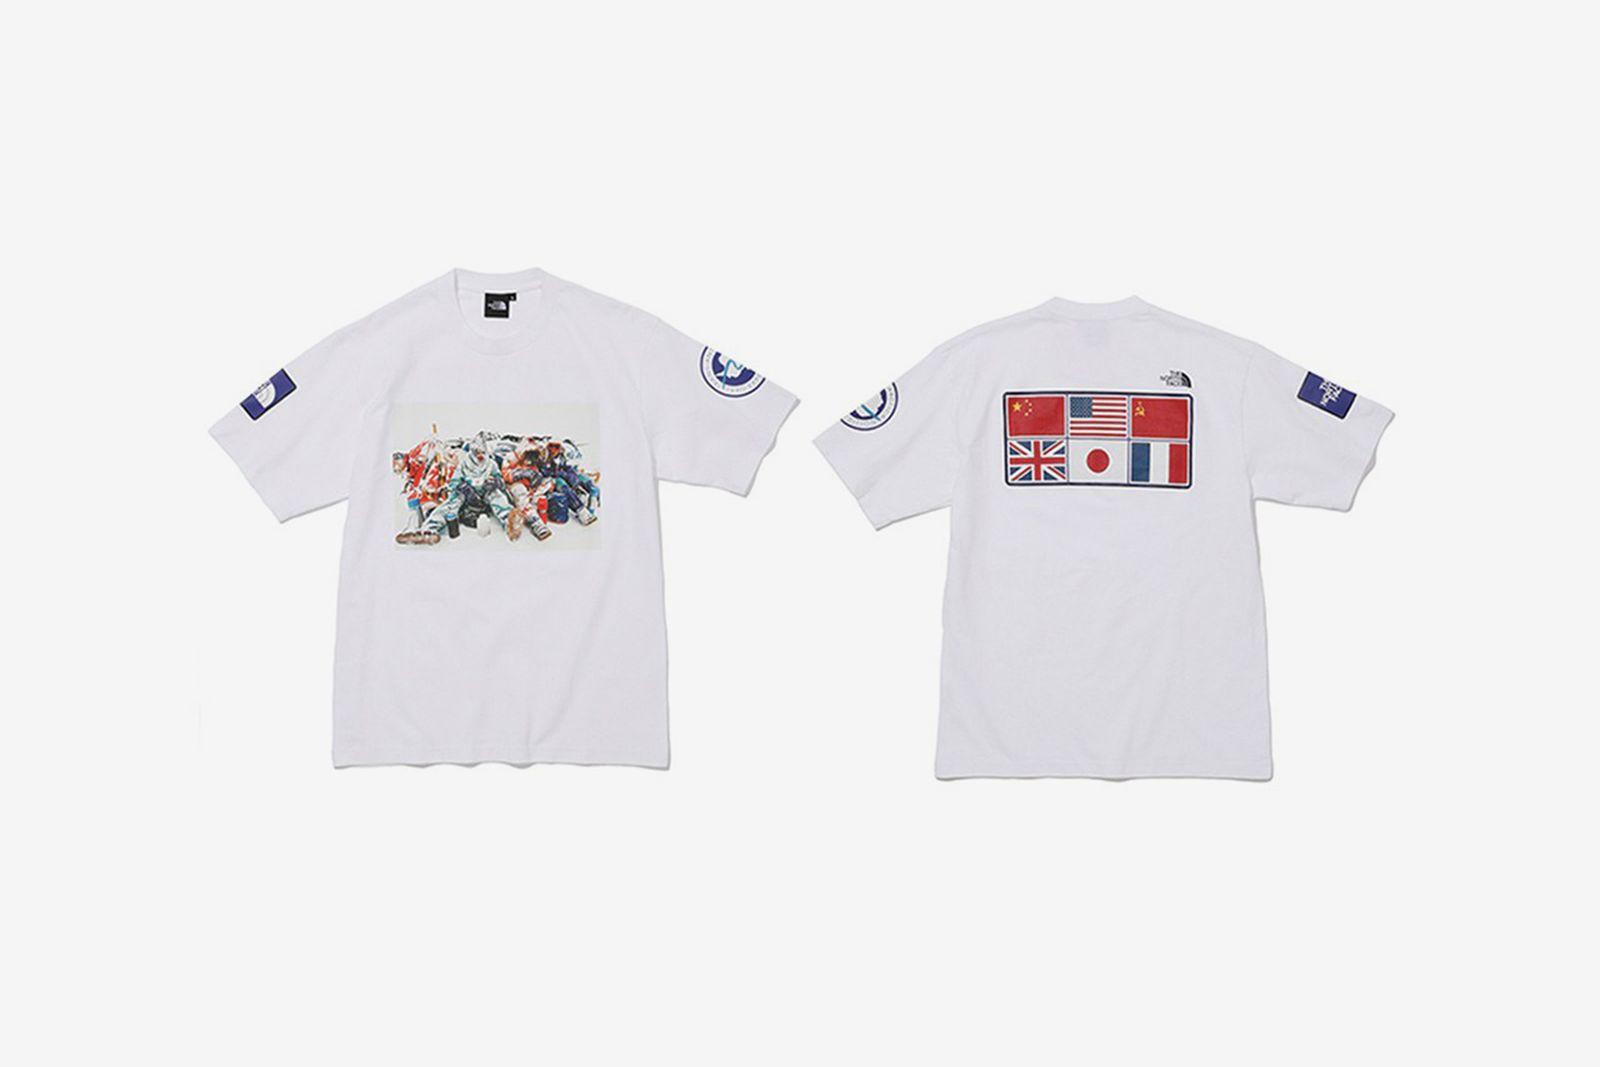 The North Face Trans-Antarctic T-shirt